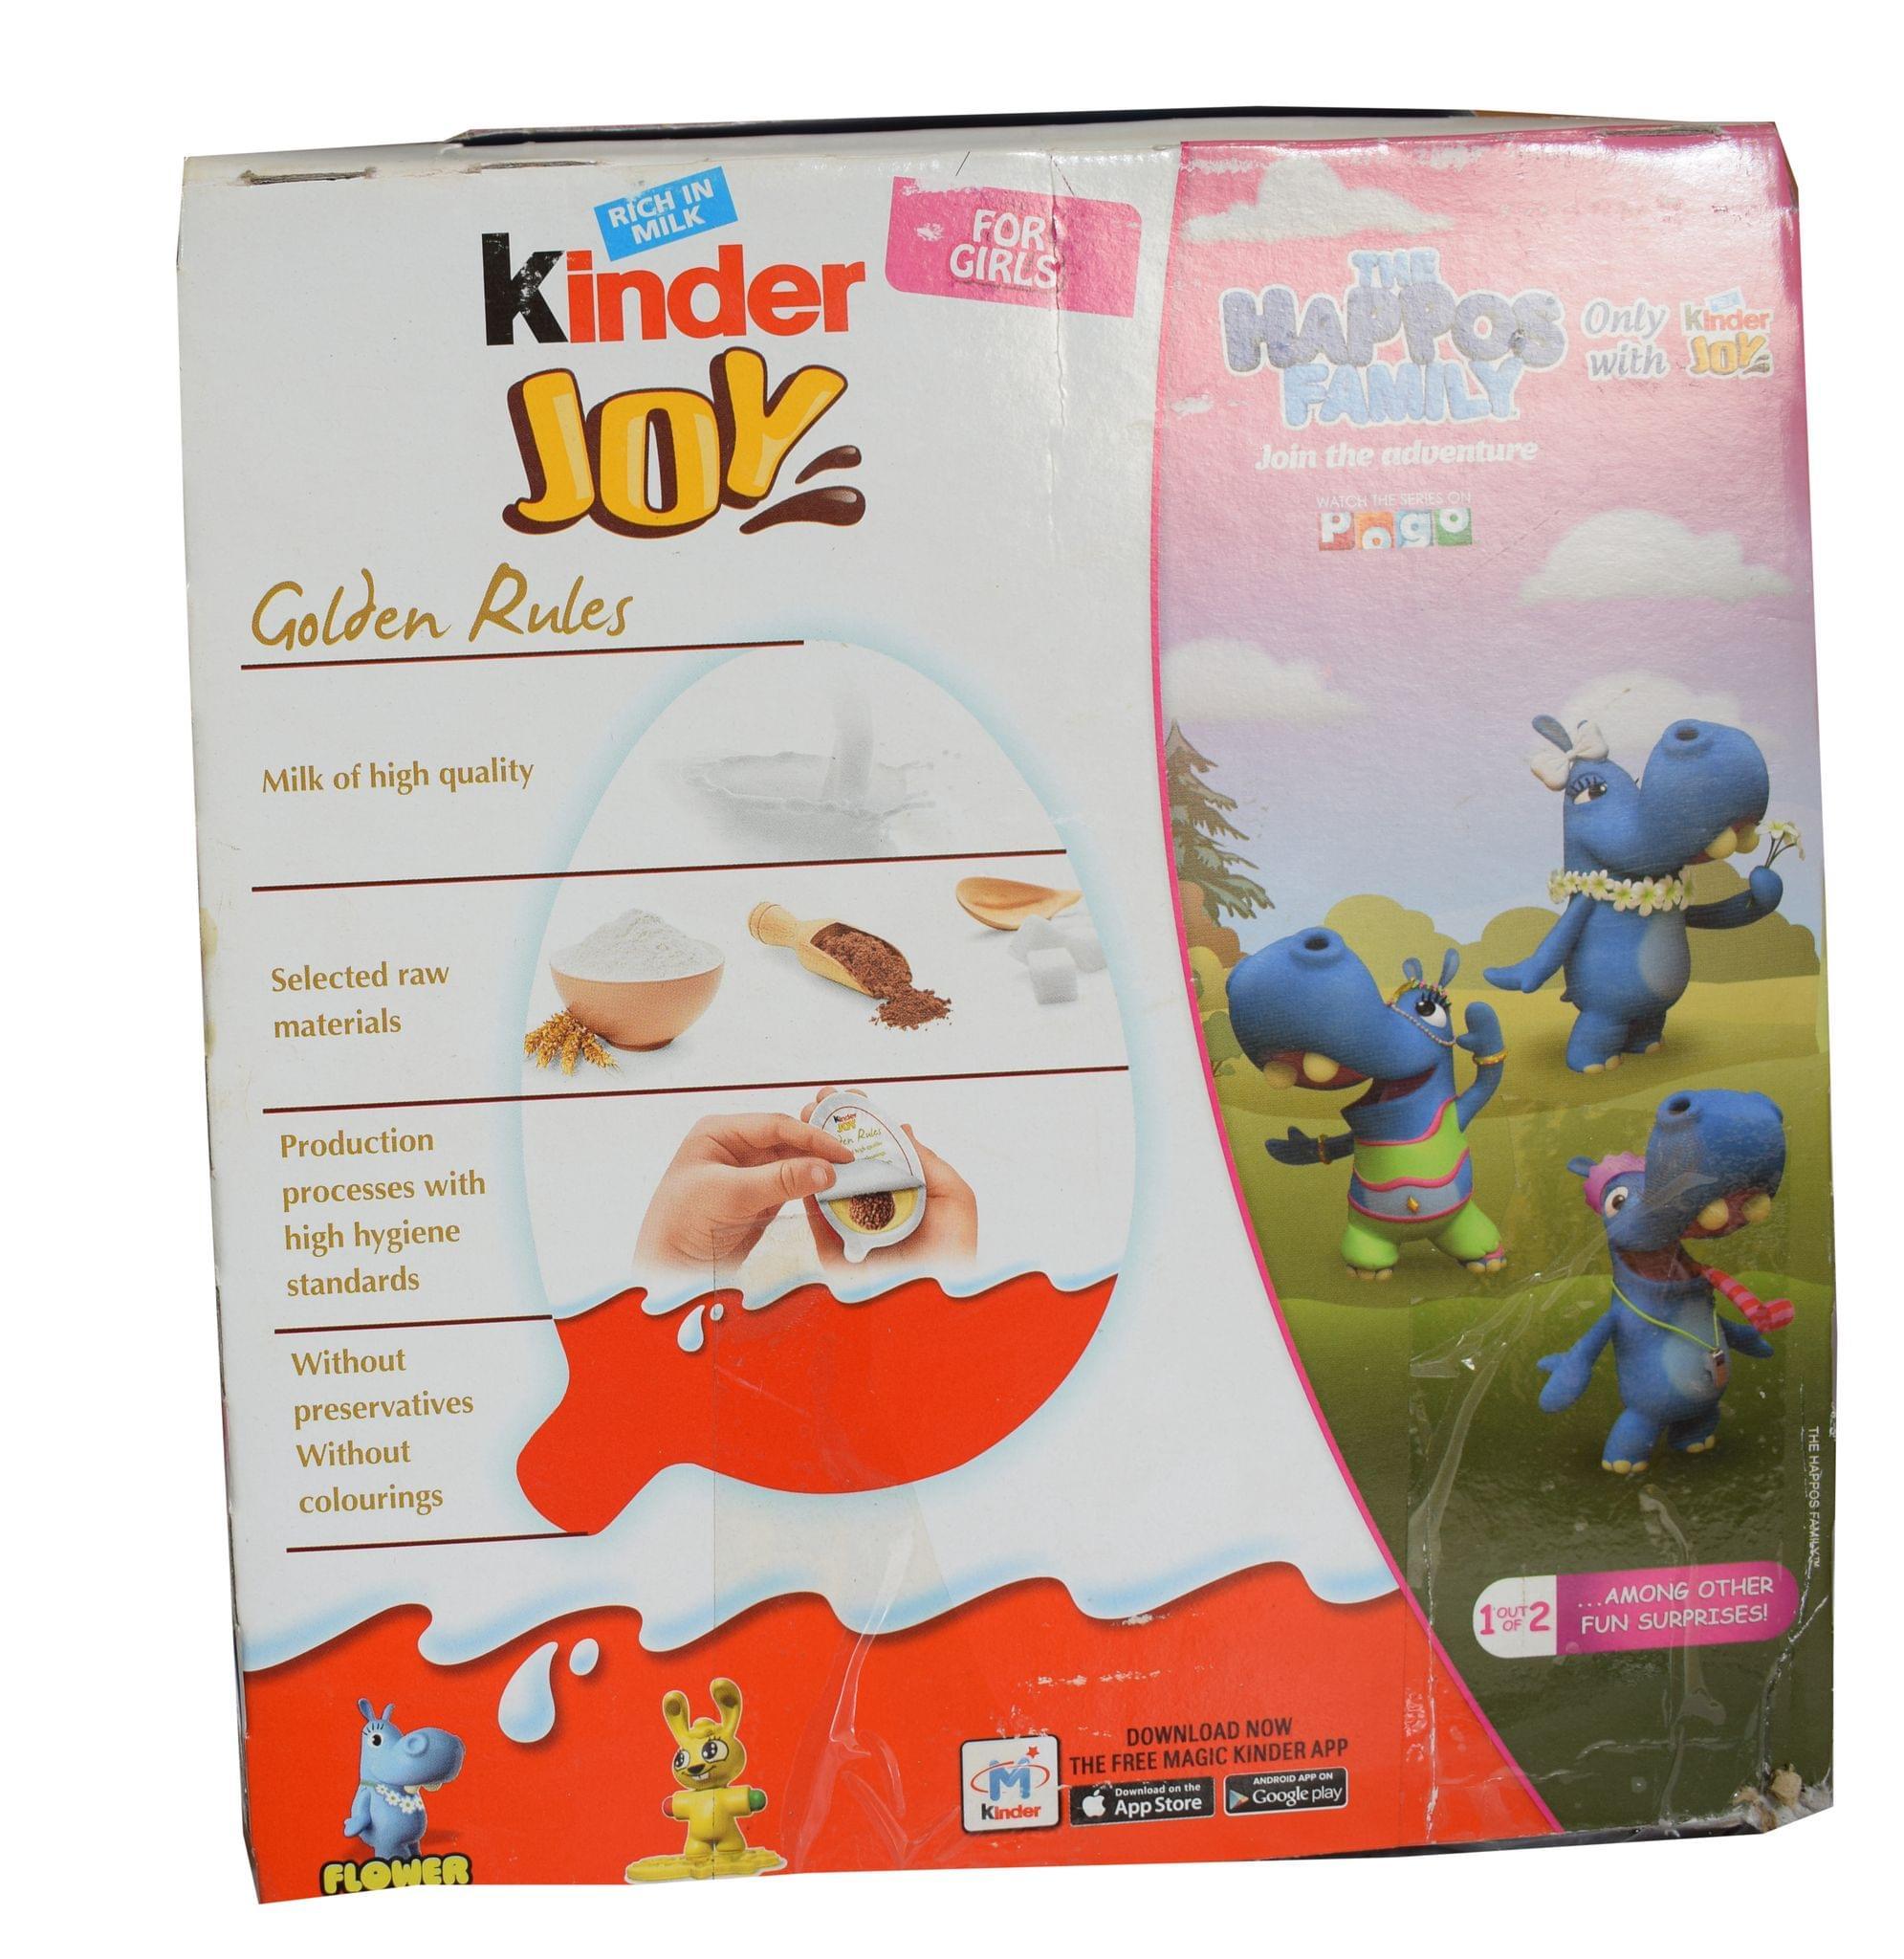 Uha Maccha Milk Reg Bag 103 G Daftar Harga Terkini Dan Terlengkap Chocolate Candy 103g Source 5af965d97344fa14b15d379a